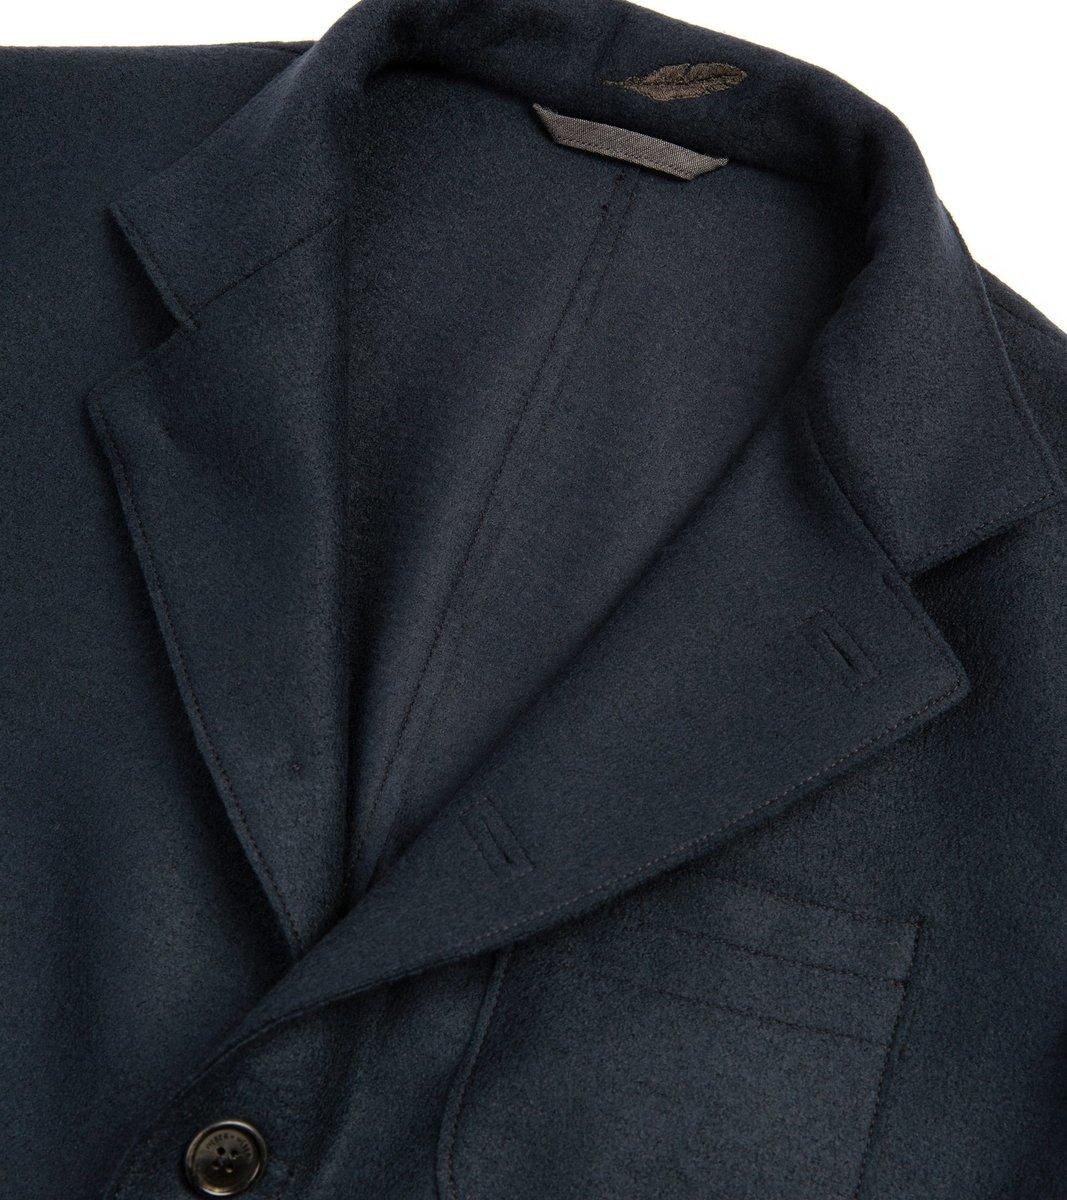 Weber_Weber-Boiled-Wool-WW-Travel-Blazer-MidnightBlue-2LR_1920x.jpg